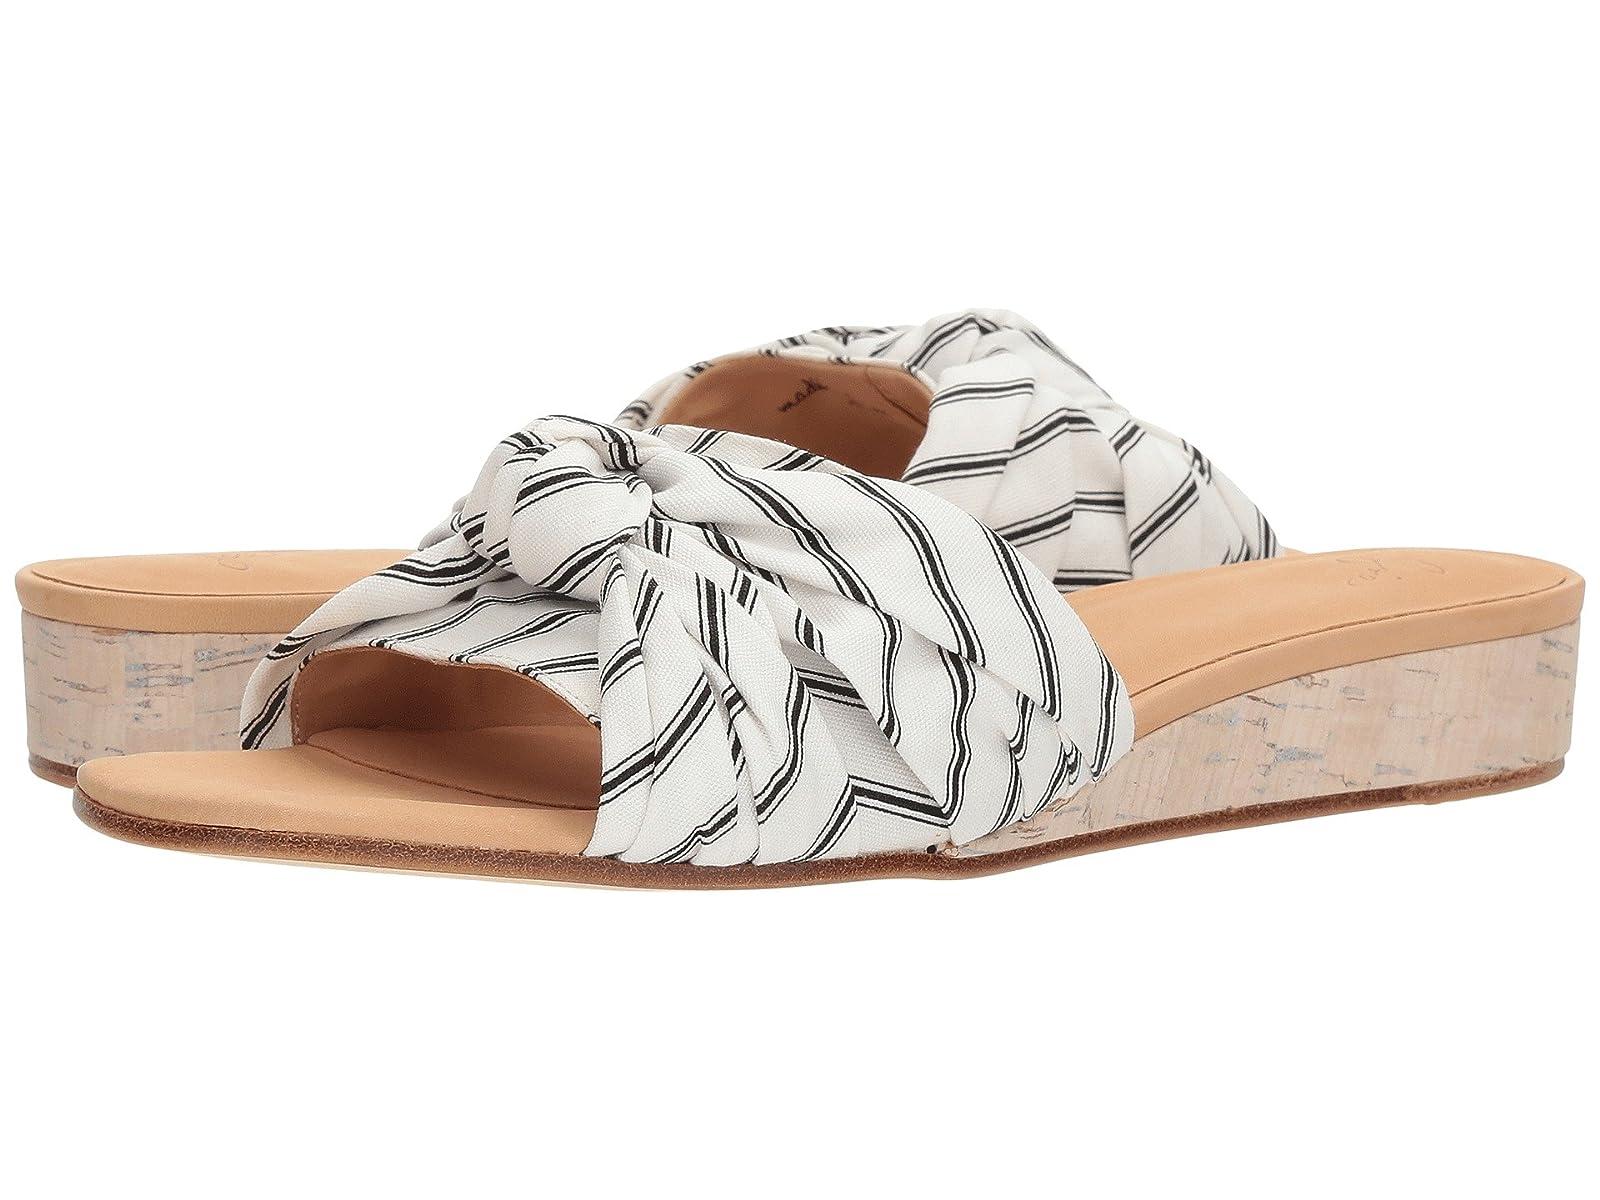 Joie FabriziaCheap and distinctive eye-catching shoes